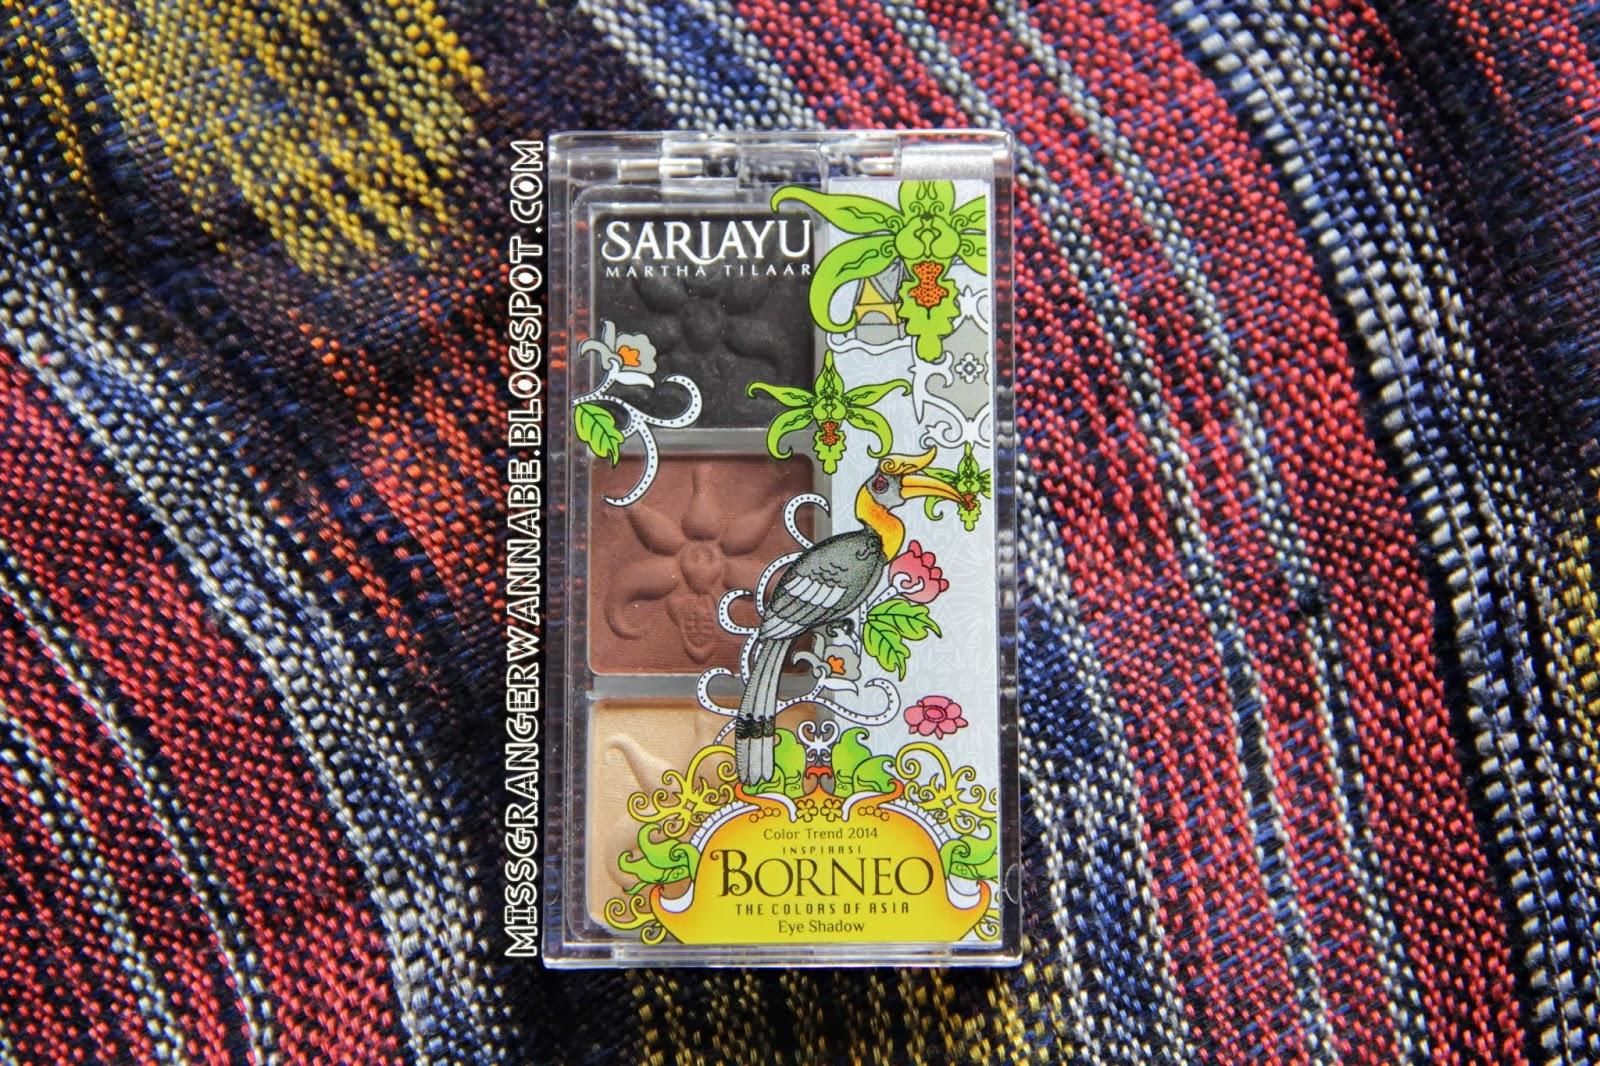 Eye Shadow Sari Ayu Borneo B-03 Review - Lia Harahap